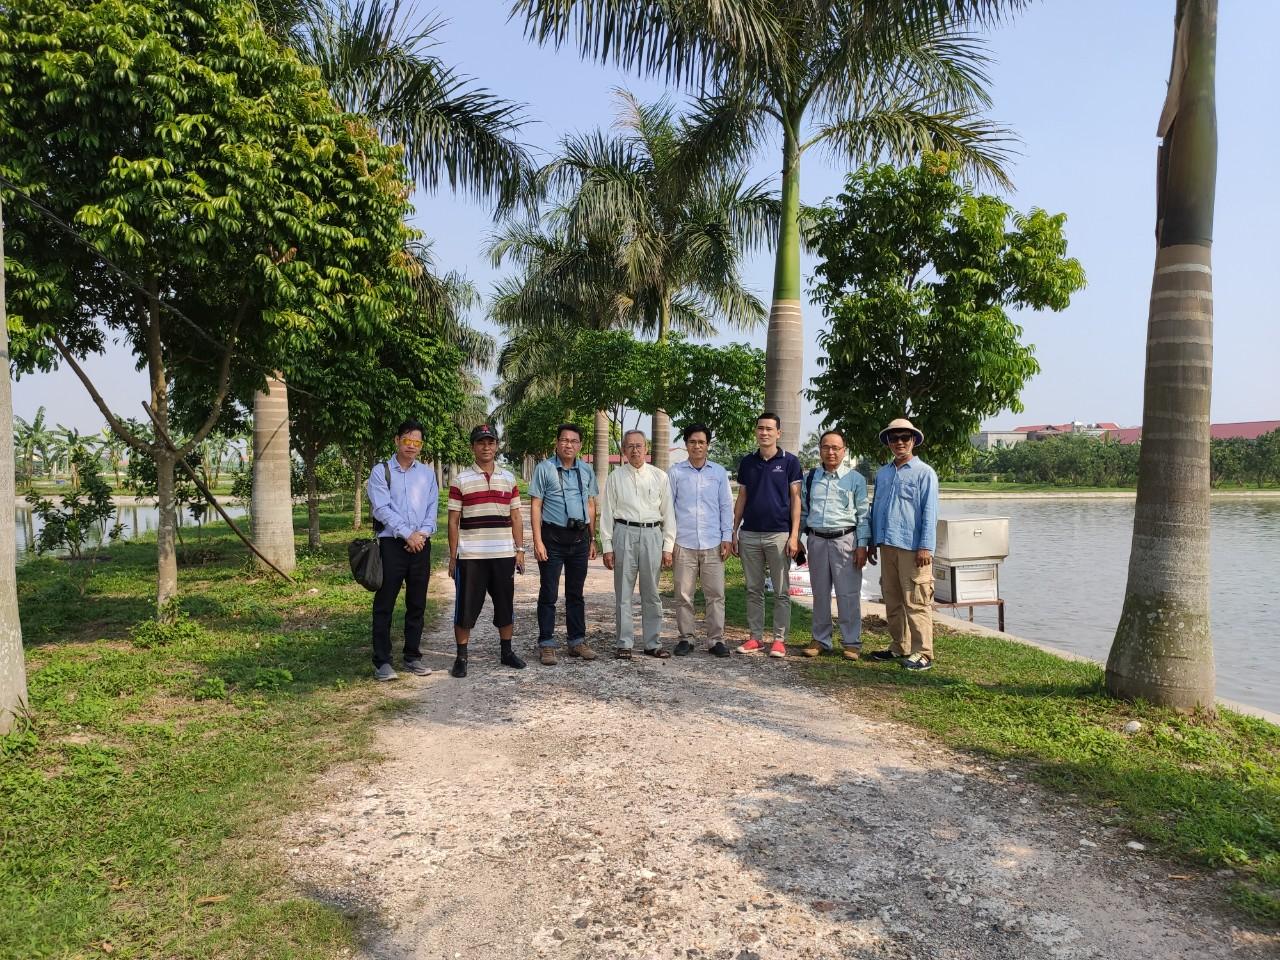 MYANMAR DELEGATIONS VISIT FISH FARM IN VIETNAM